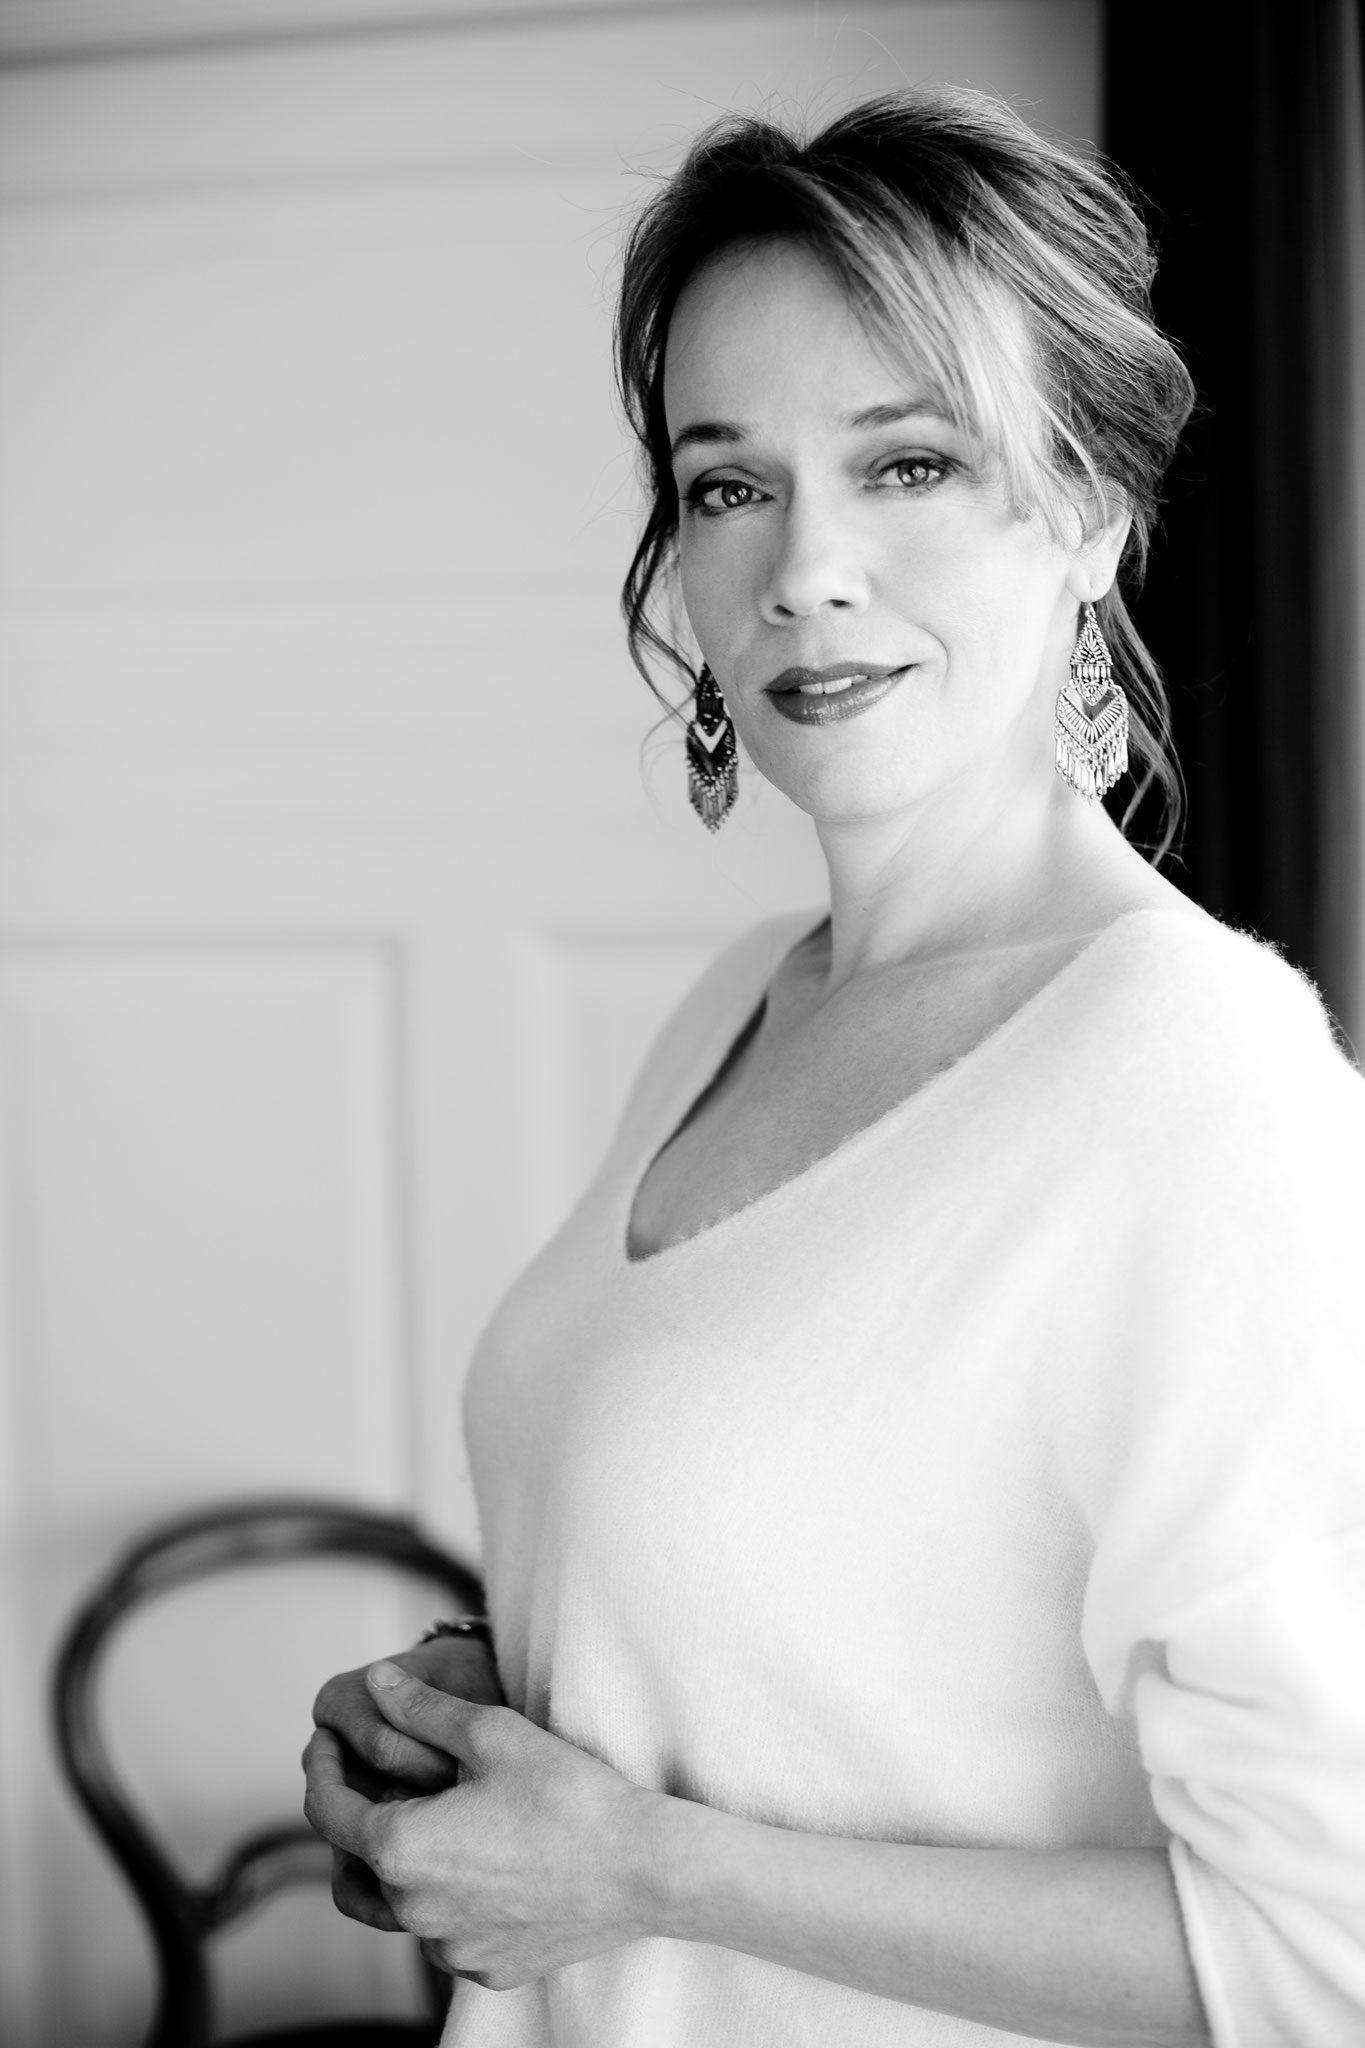 Foto: Lena Kern